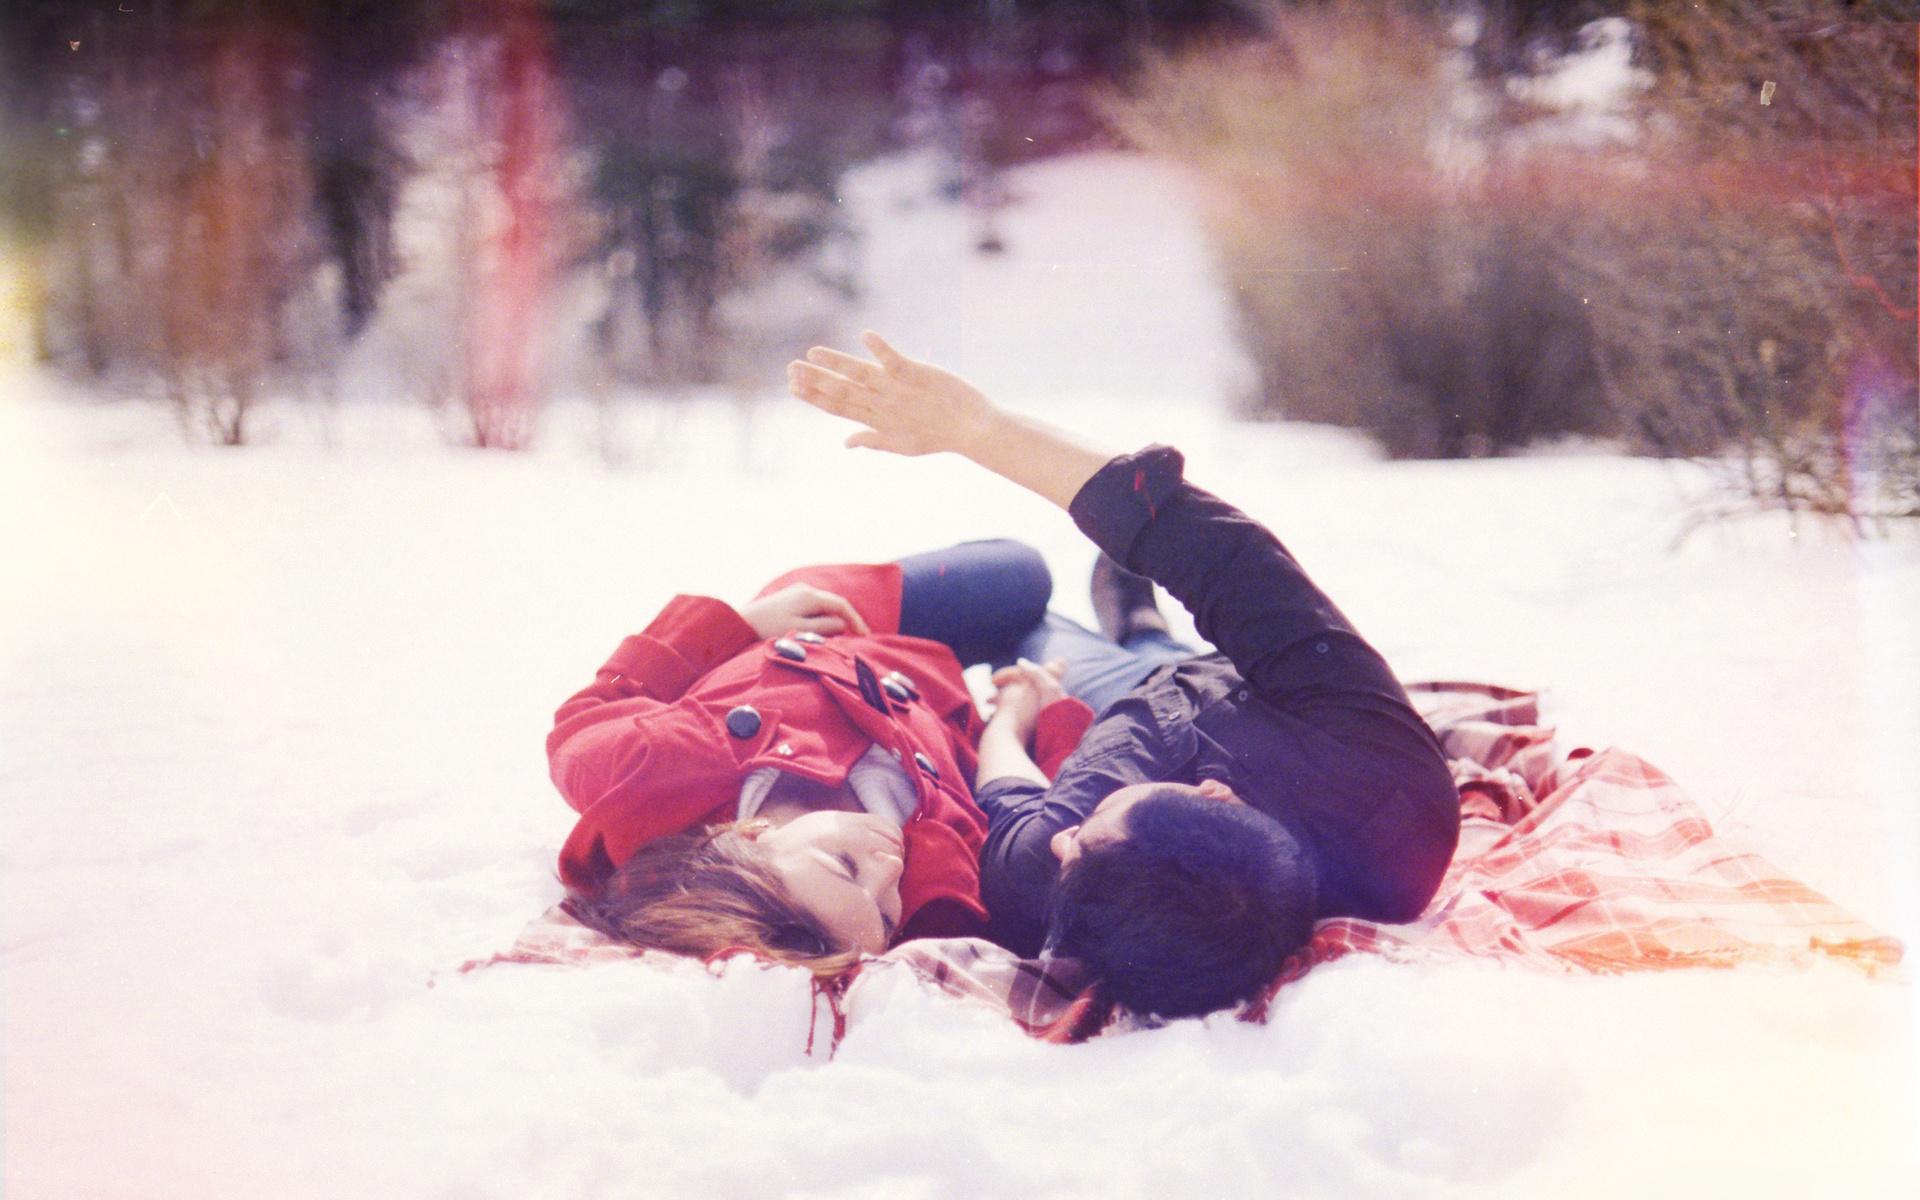 Дурак в снегу - hd видеохостинг киносток